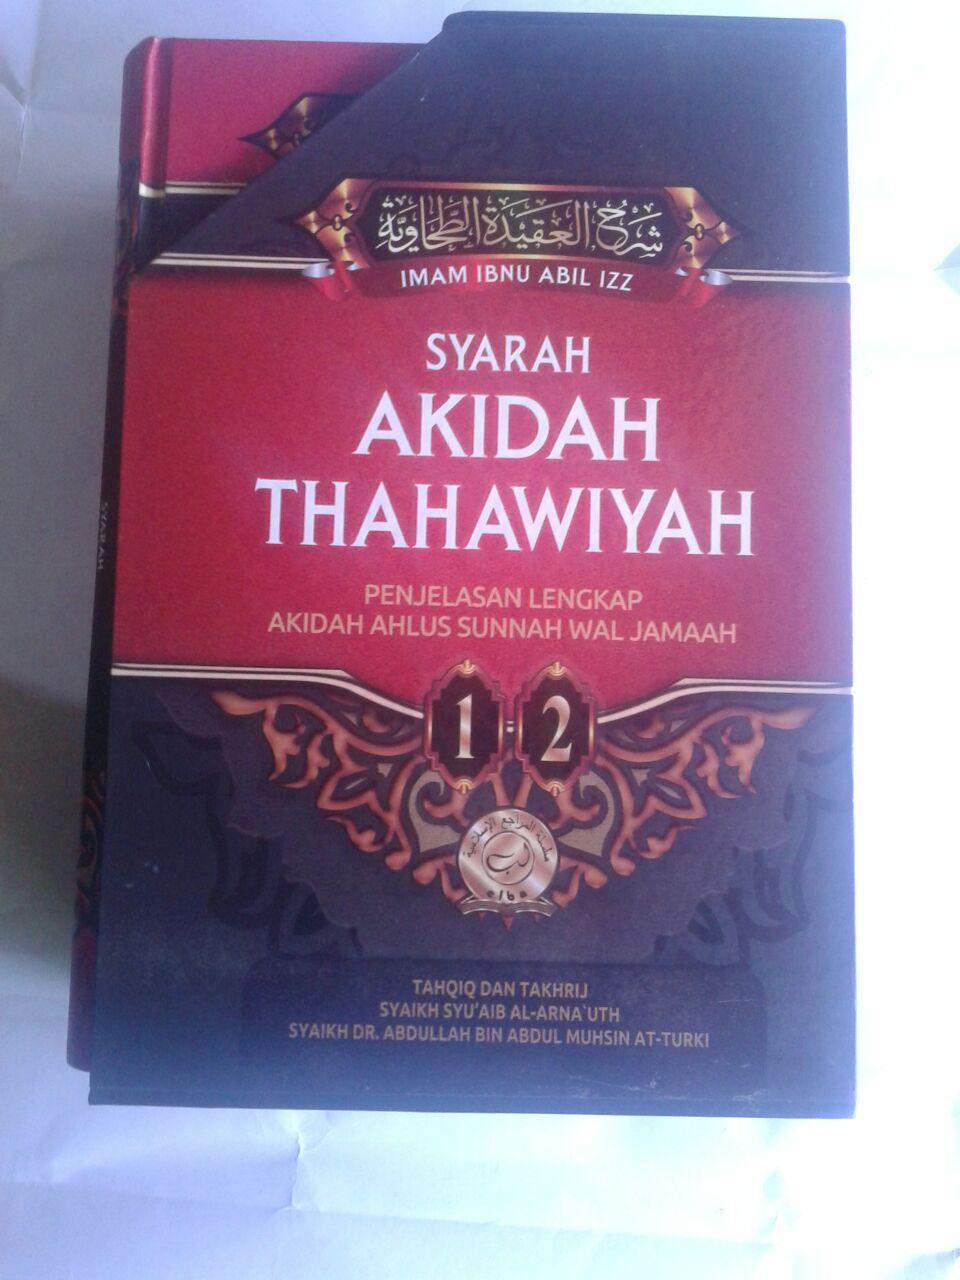 Buku Syarah Akidah Thahawiyah Akidah Ahlussunnah cover